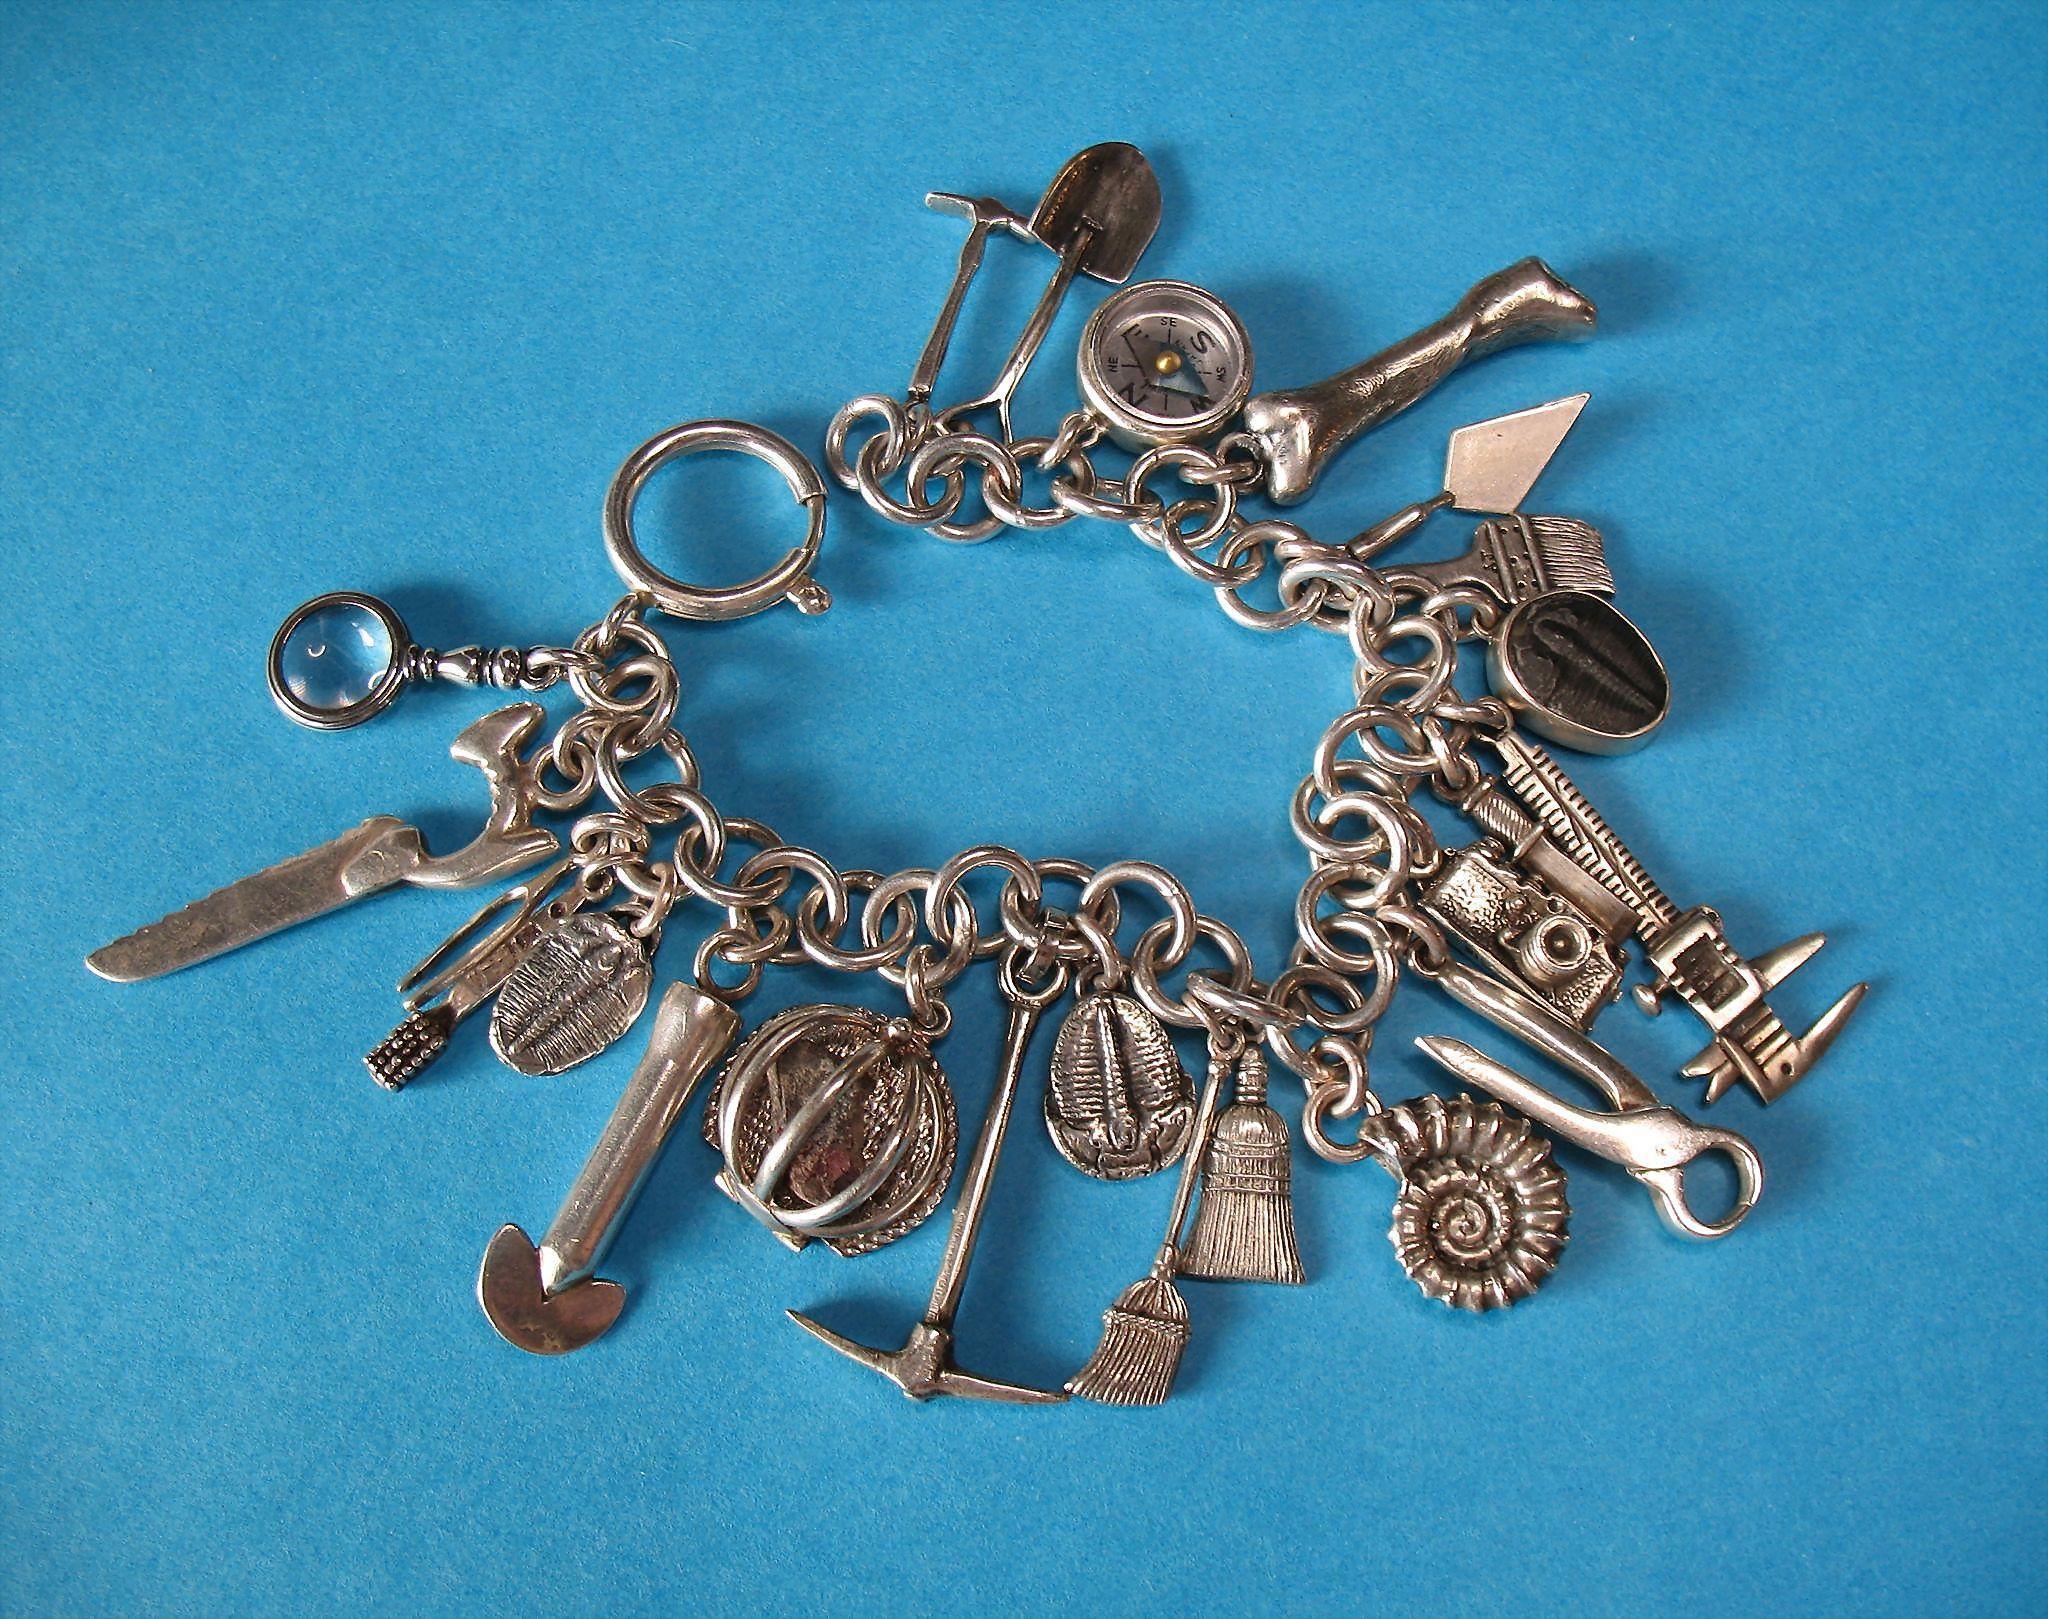 Item ID: jfg-002517 In Shop Backroom